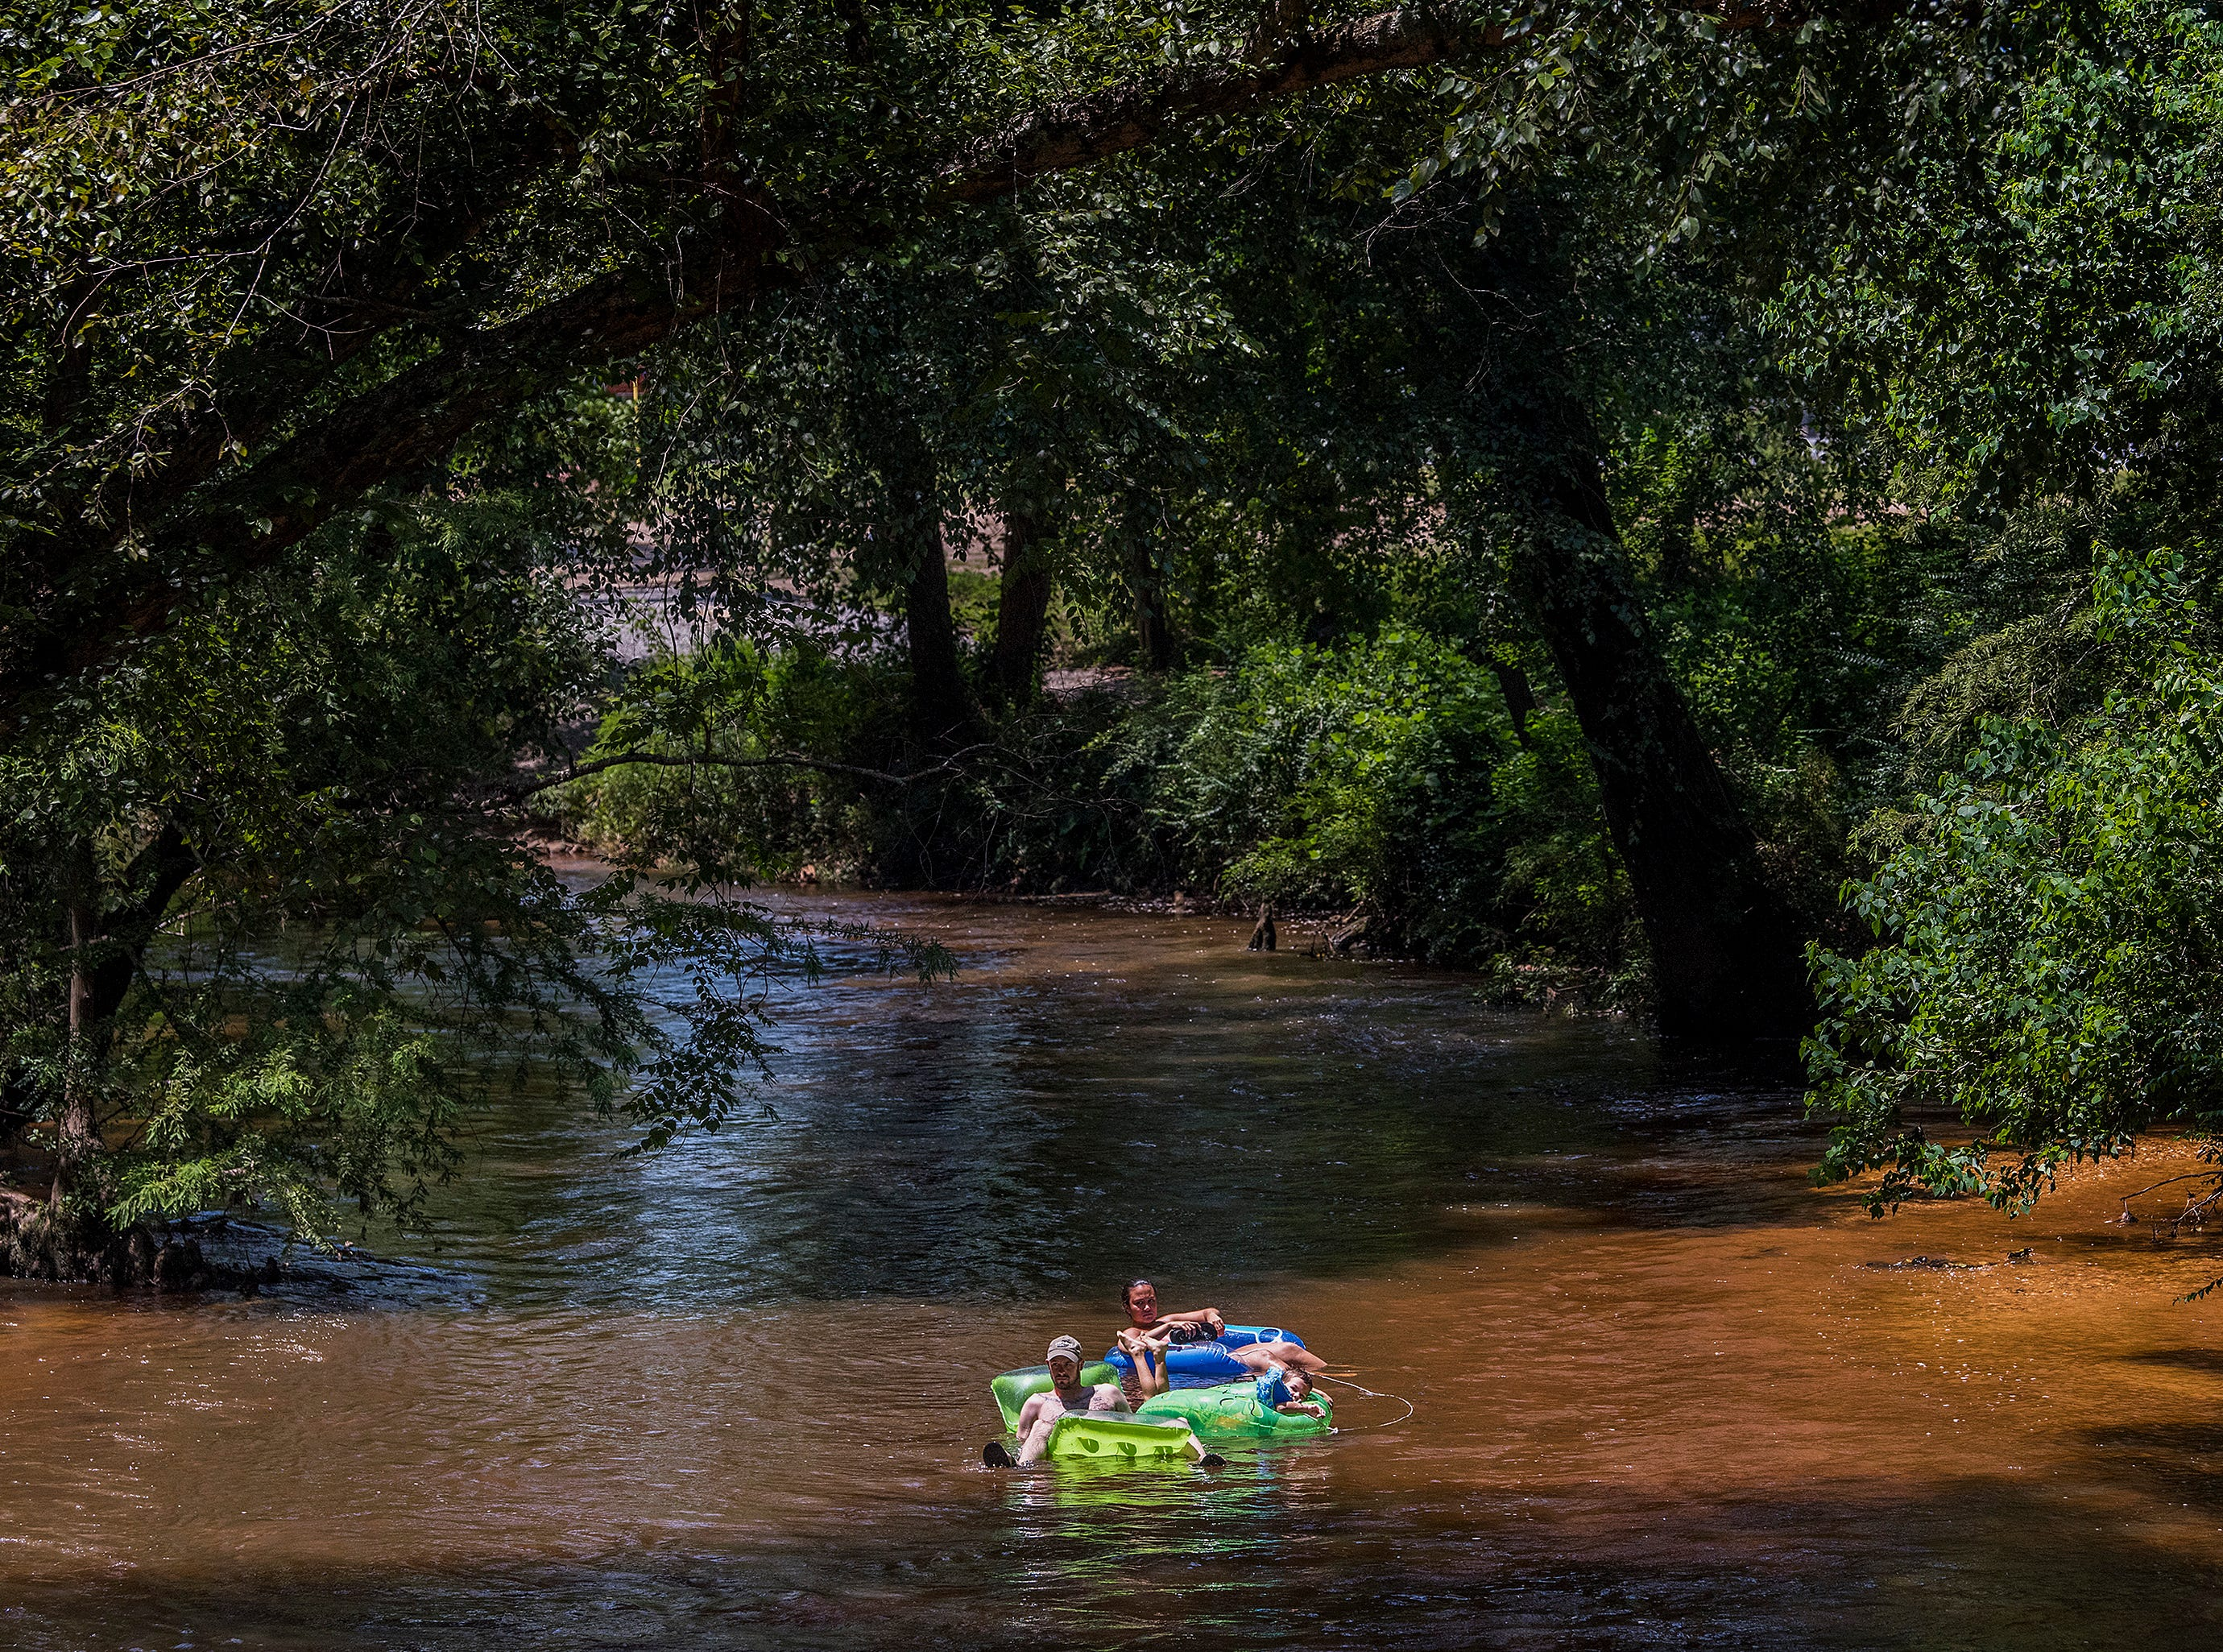 Blake Bailey, Coen Bailey and Cassandra George float down Autauga Creek in Prattville, Ala., on Saturday, July 21, 2018.